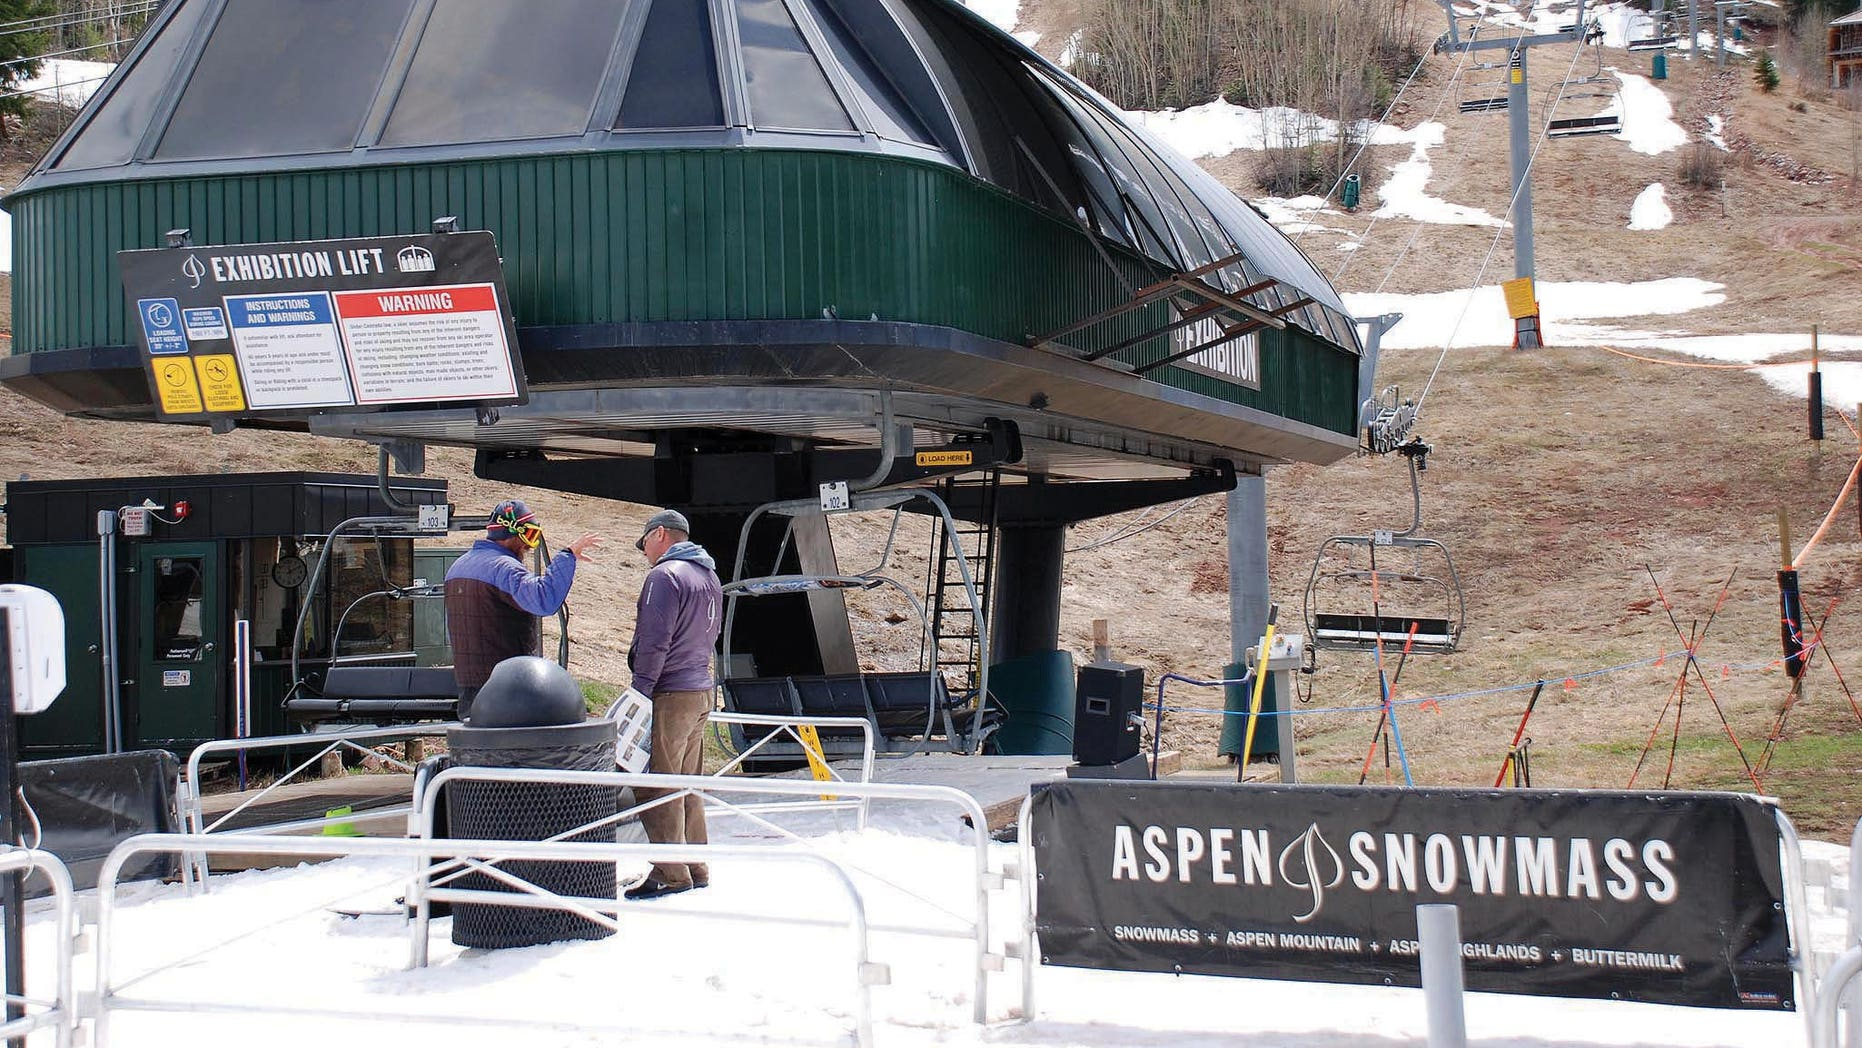 Aspen Highlands in 2012.